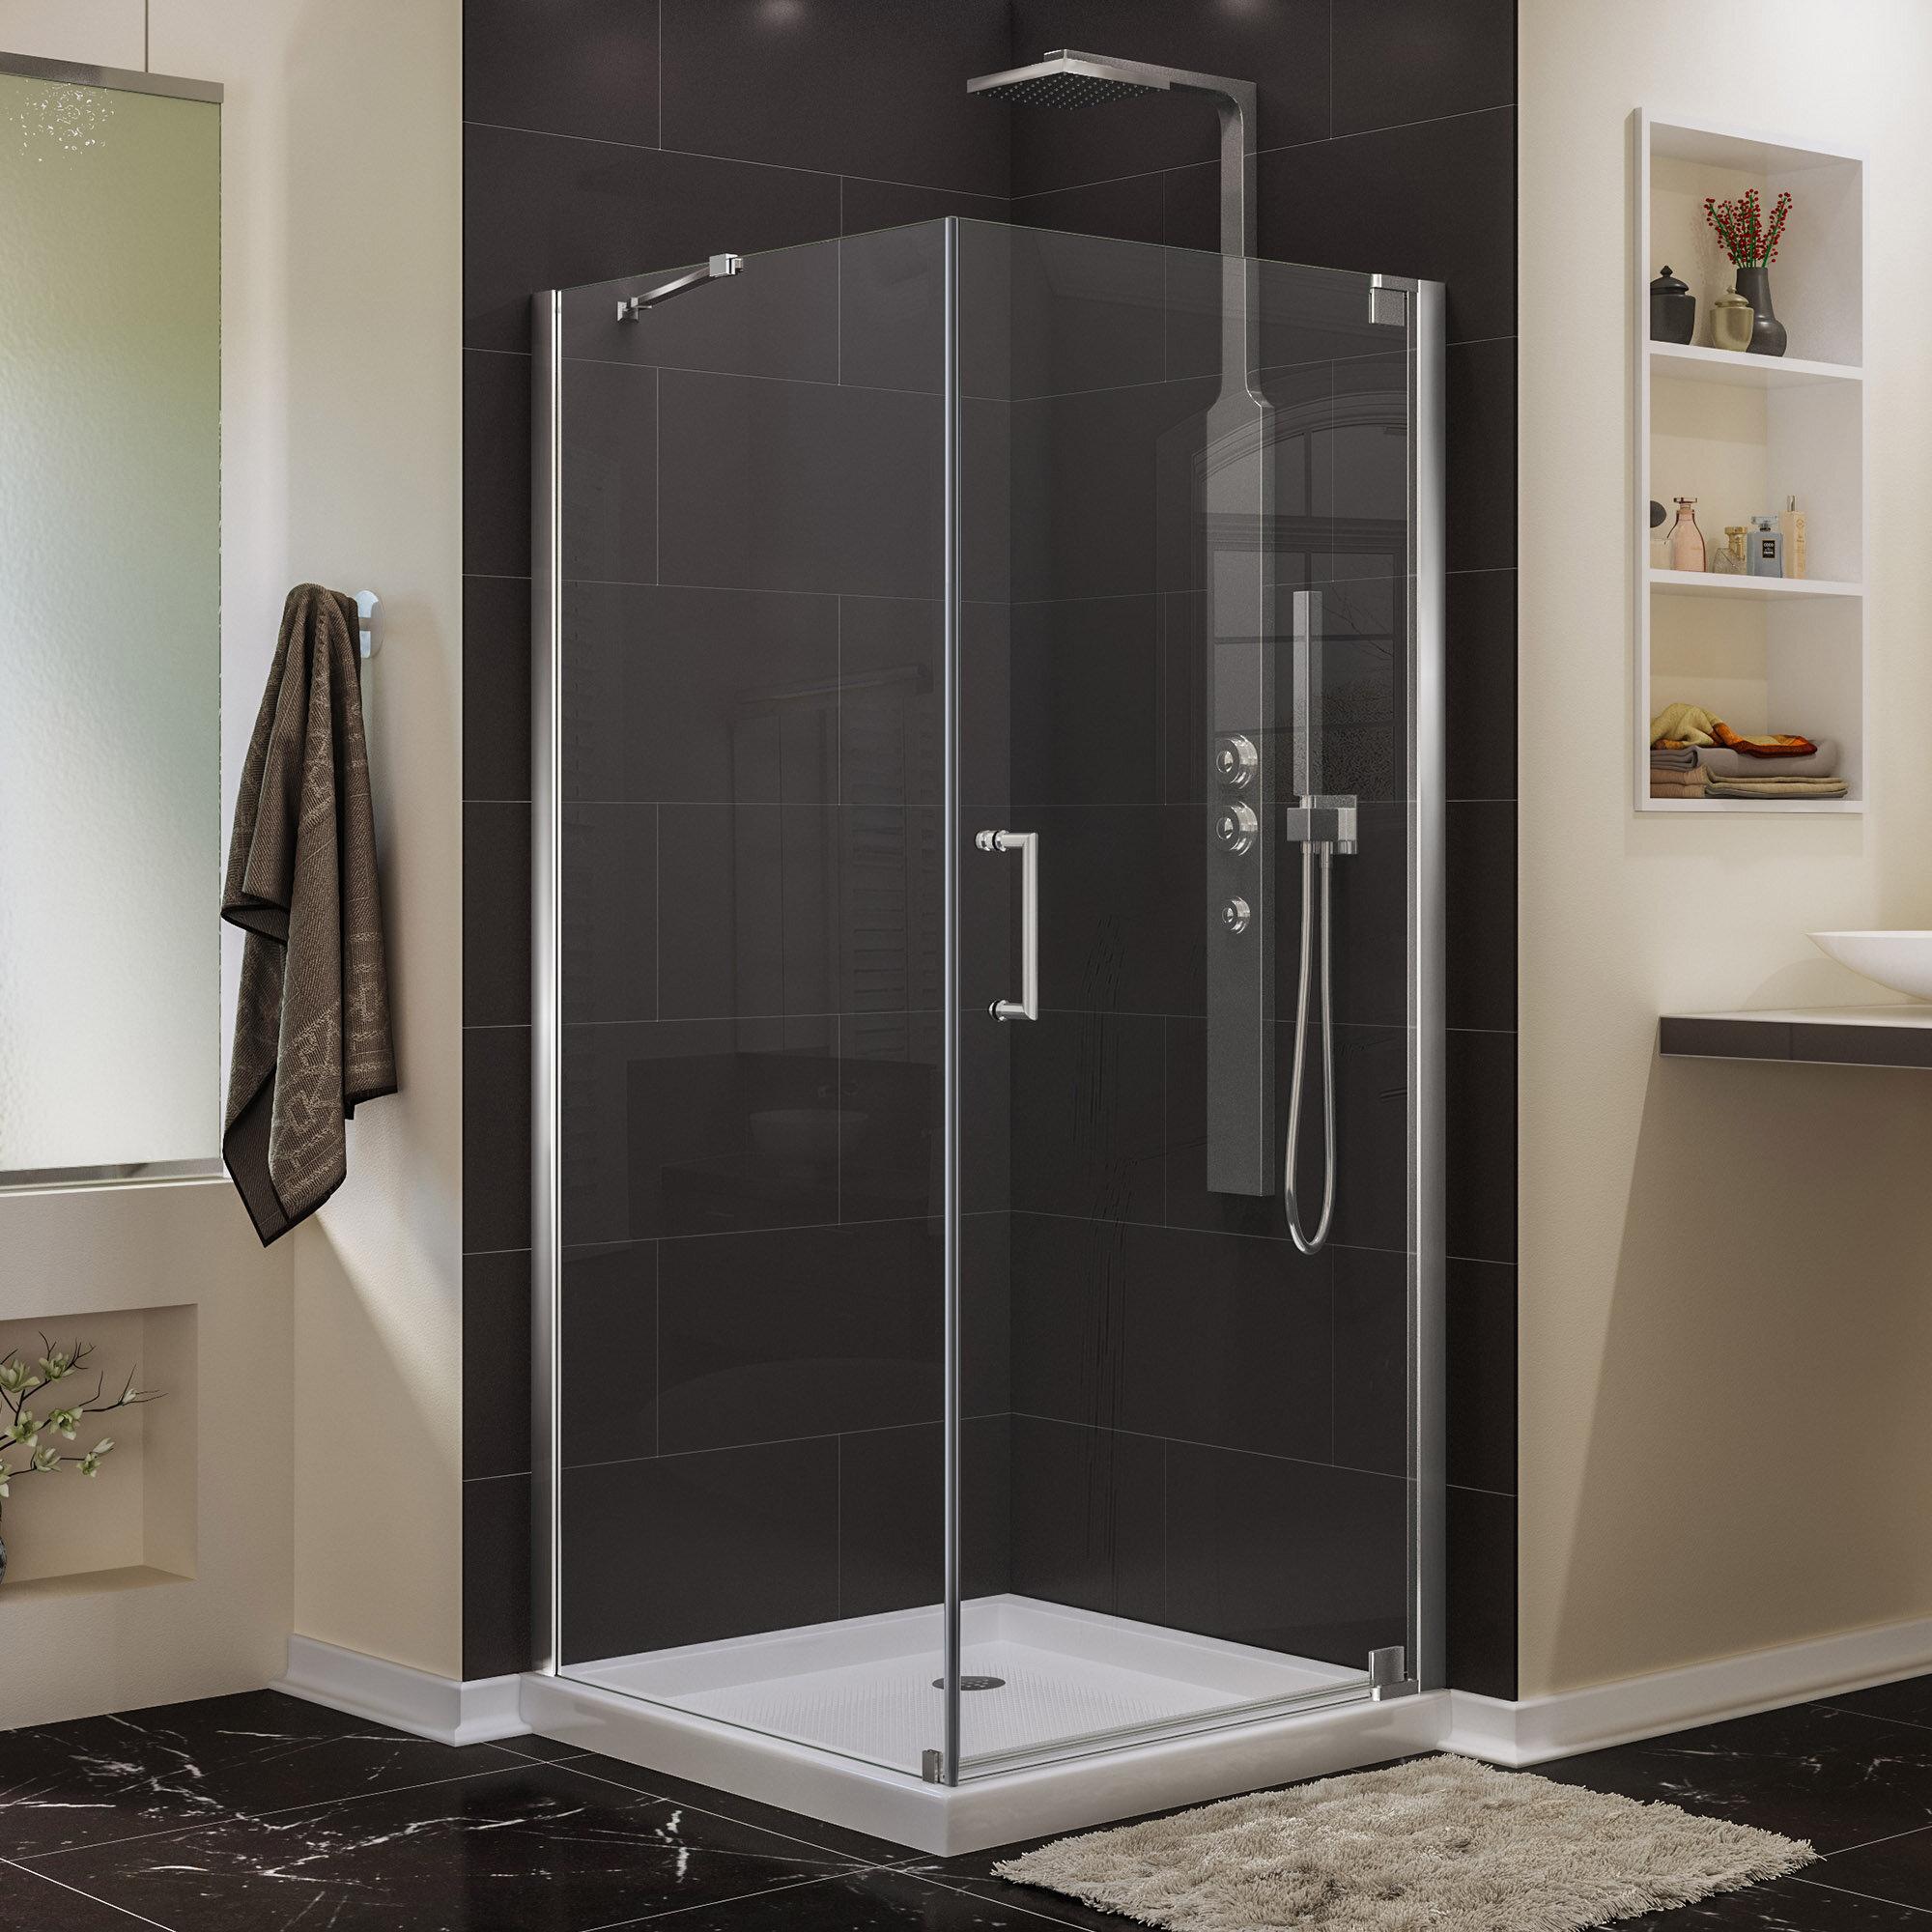 Dreamline Elegance 30 X 72 Pivot Frameless Shower Door With Clear